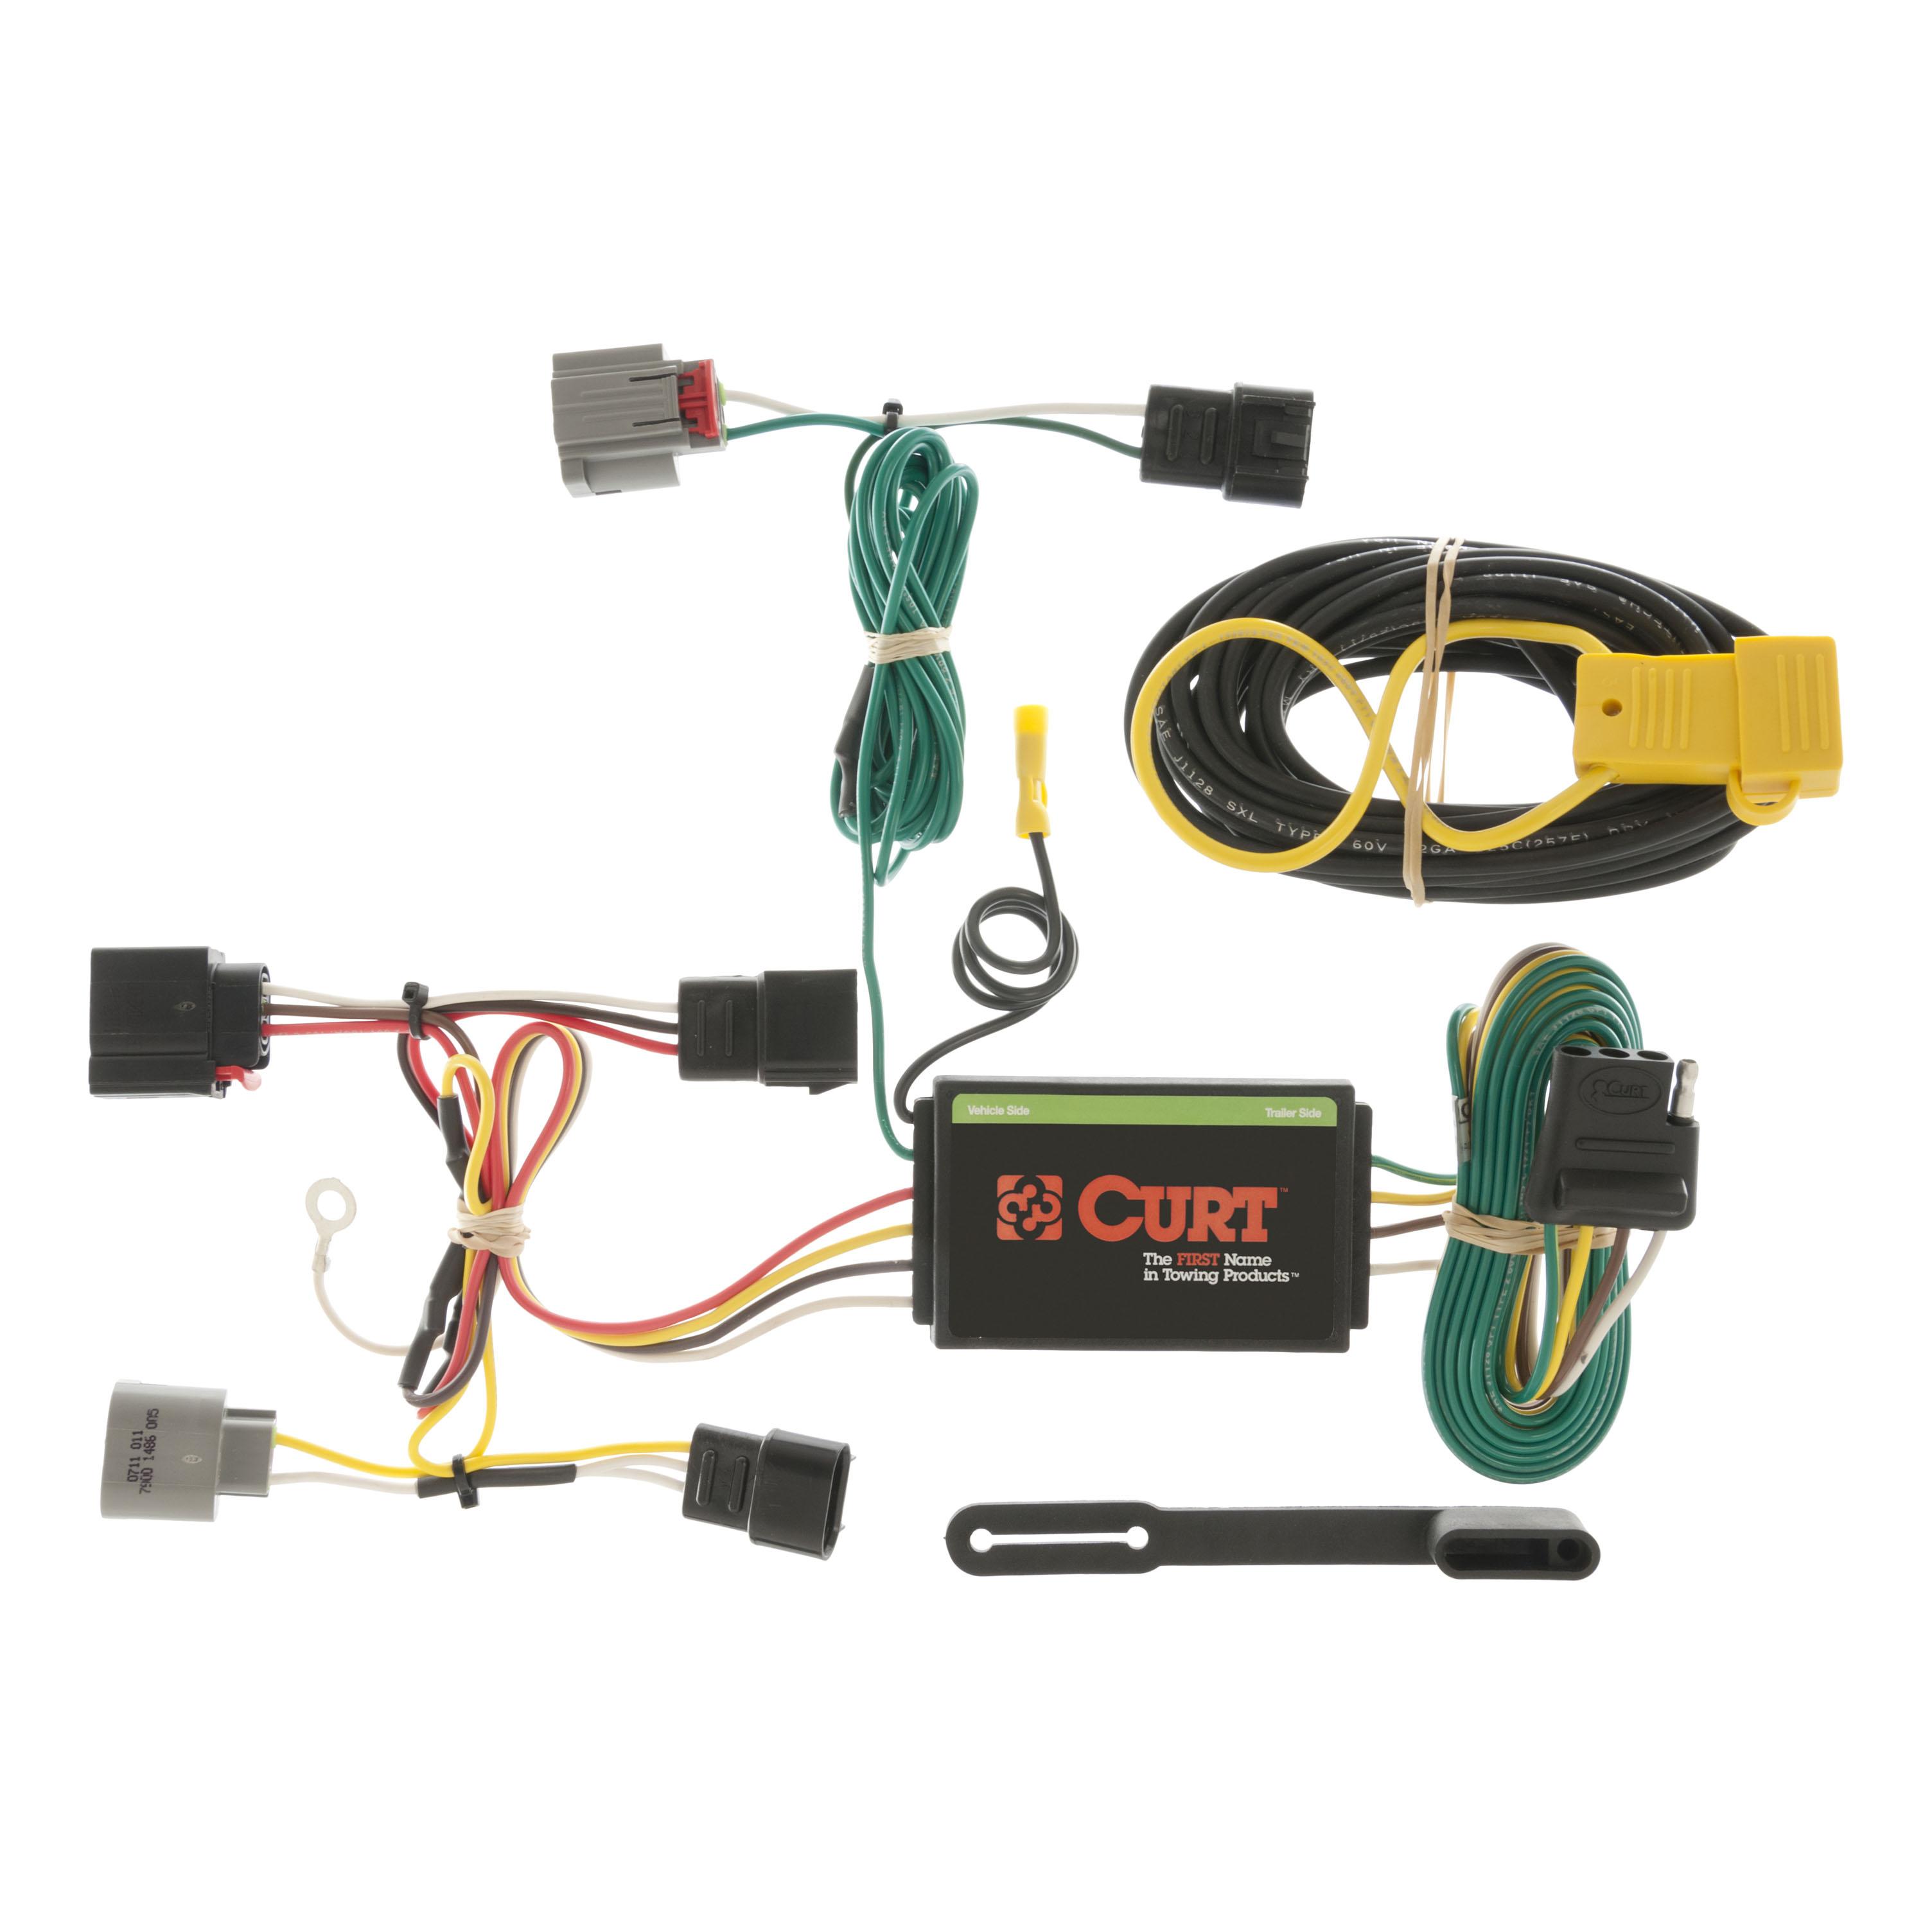 curt custom vehicle to trailer wiring harness 56054 for 07 10 rh ebay com Chrysler Engine Wiring Harness 2007 chrysler pacifica trailer wiring harness